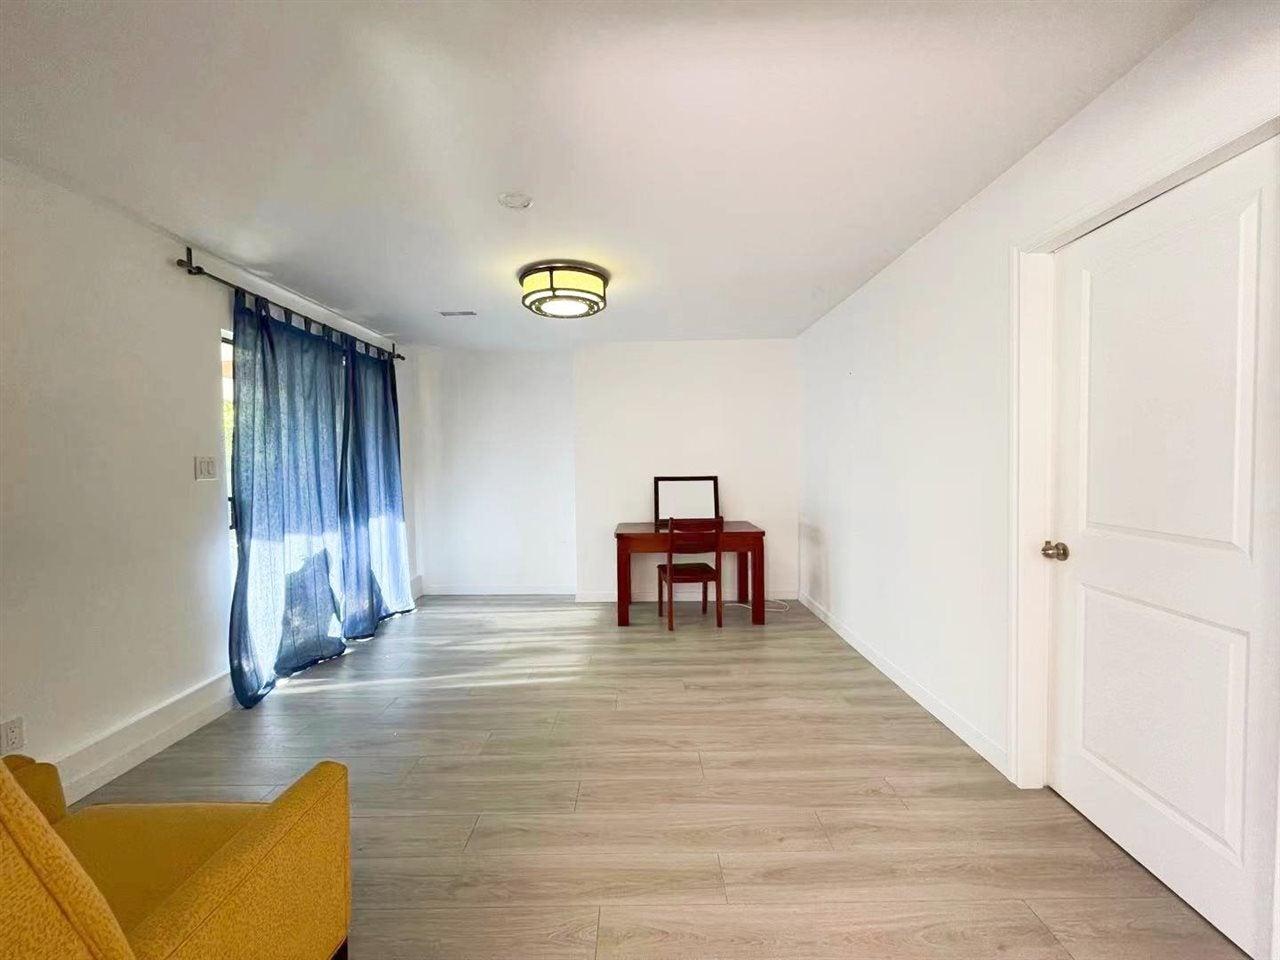 8991 ST. ALBANS ROAD - Garden City 1/2 Duplex for sale, 5 Bedrooms (R2576083) - #17